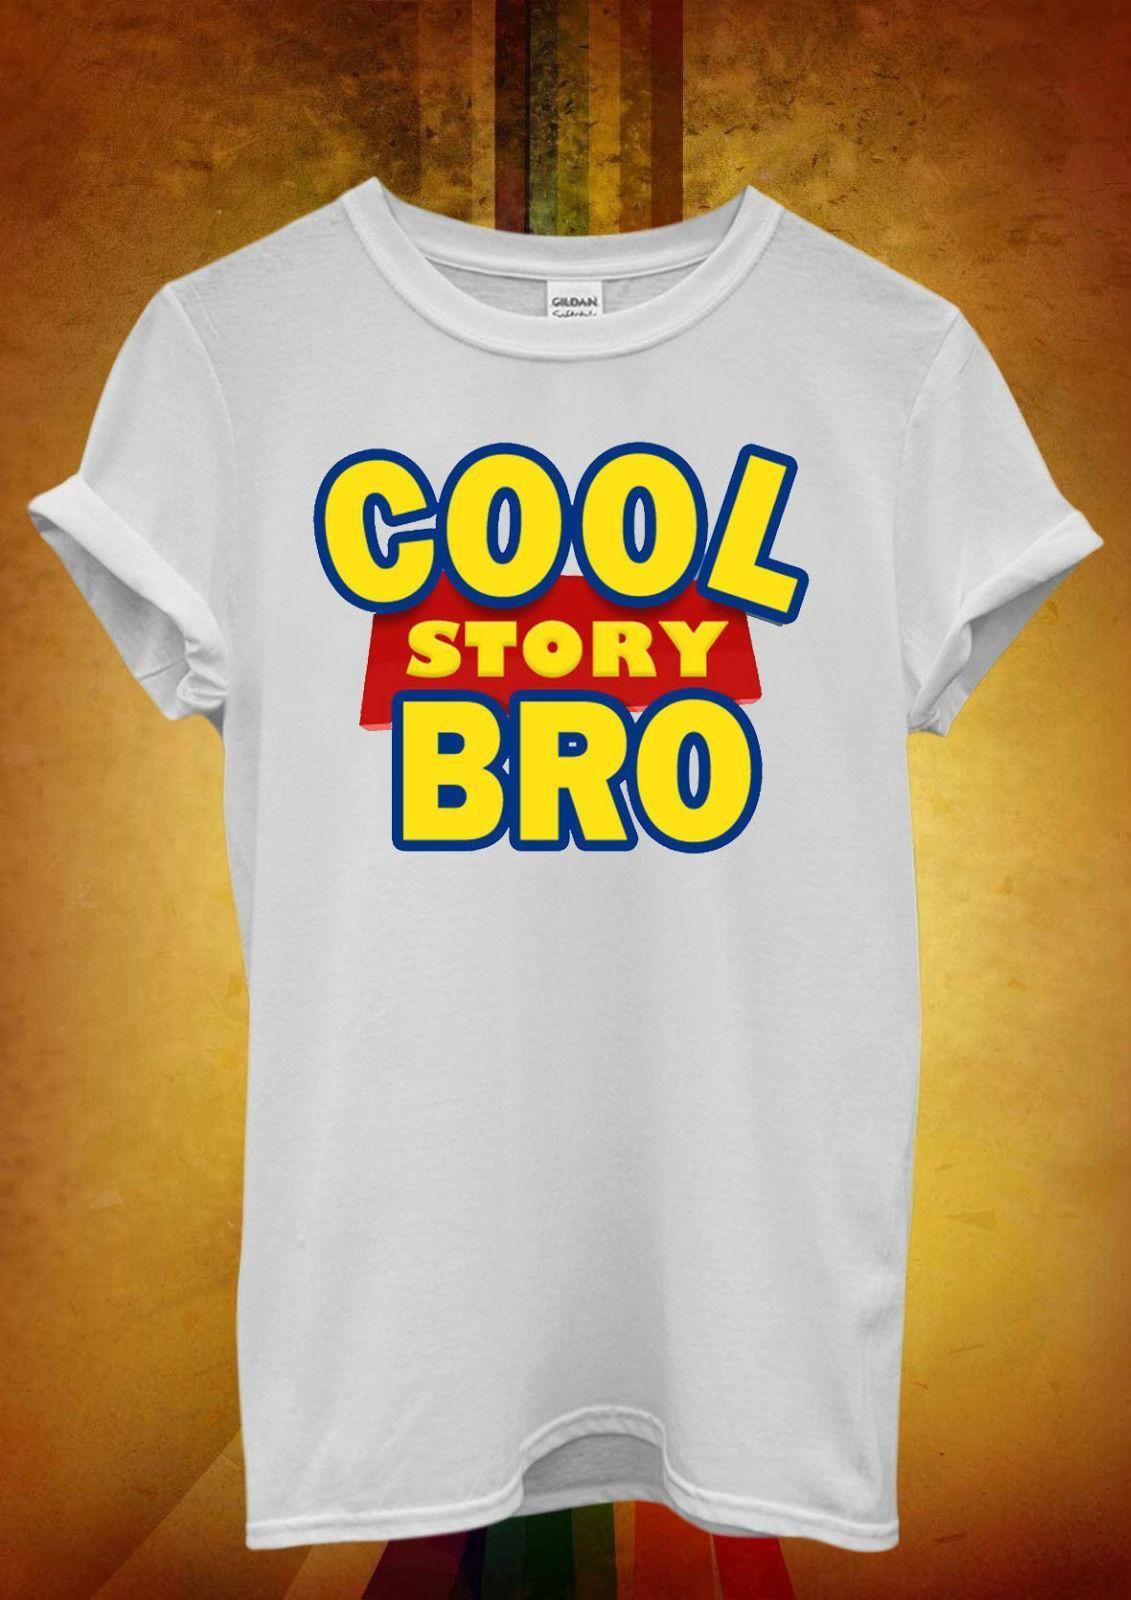 f2ba3f08 Cool Story Bro Toy Meme Tell It Again Men Women Unisex T Shirt Tank Top  Vest 645 Funny Tshirts Long Sleeve Shirts From Yubin8, $27.6| DHgate.Com